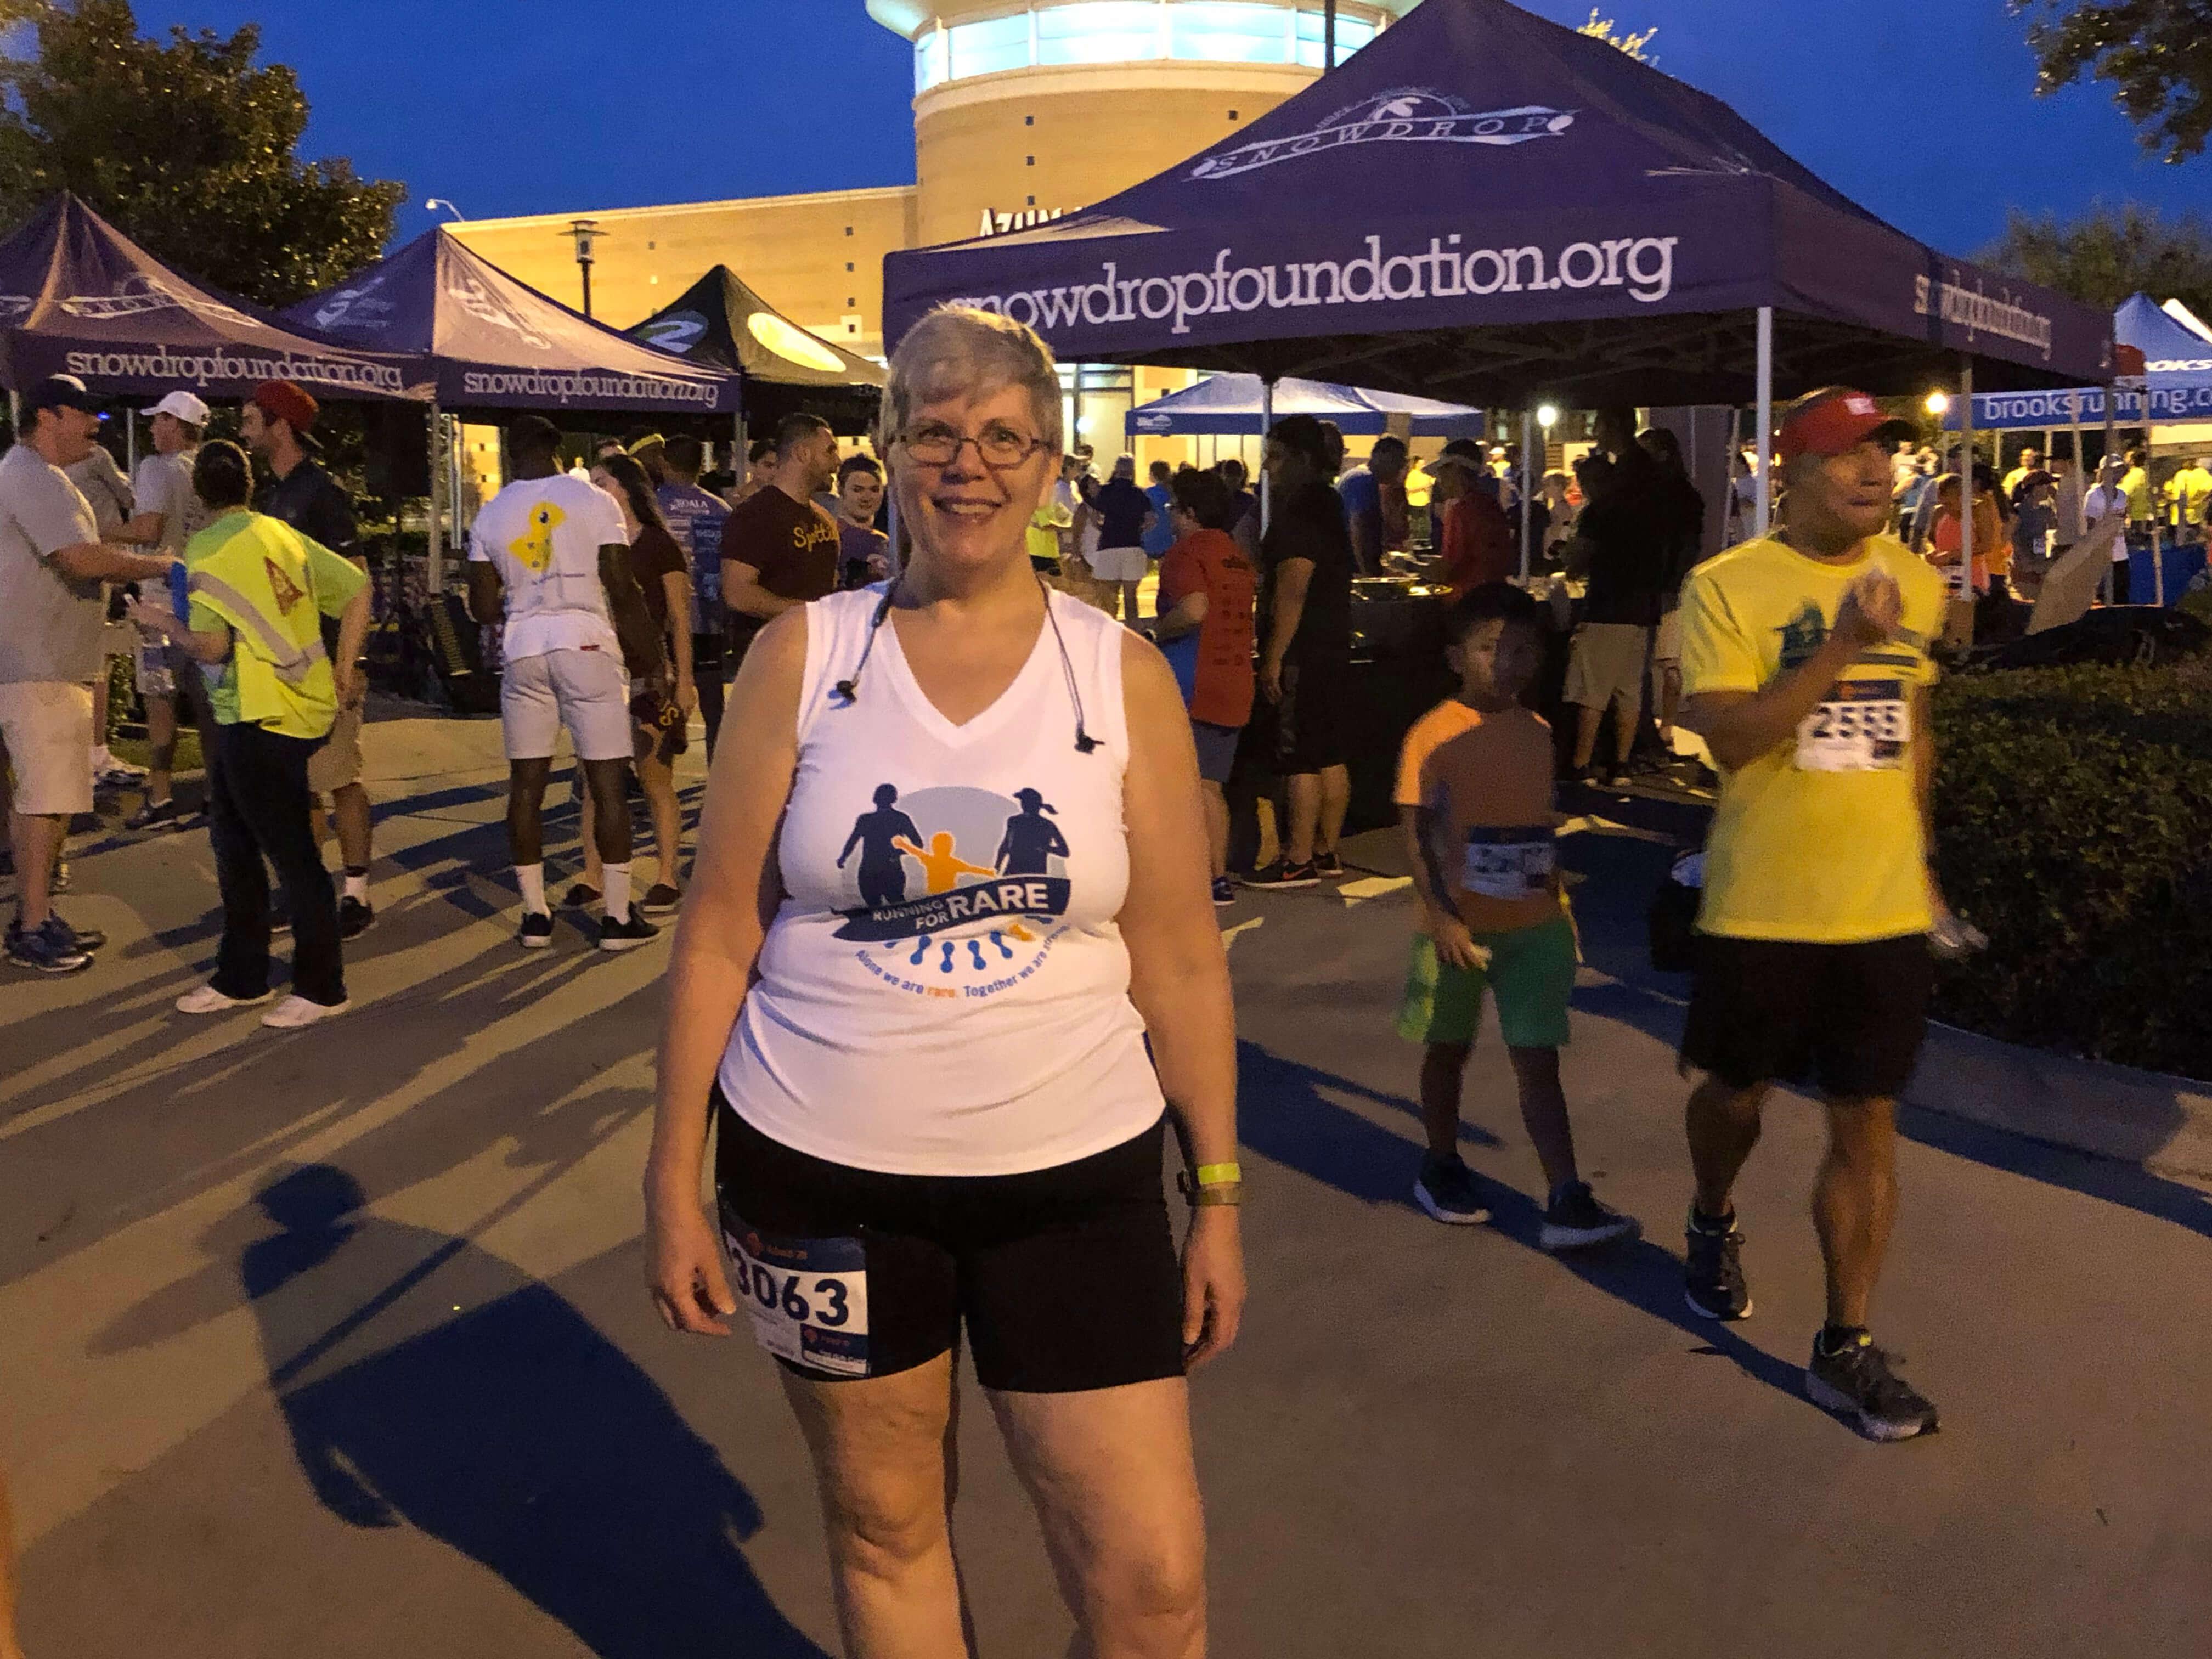 Deborah Skolaski runs half-marathons to raise awareness and funds for NORD. (Photo courtesy of Deborah Skolaski)